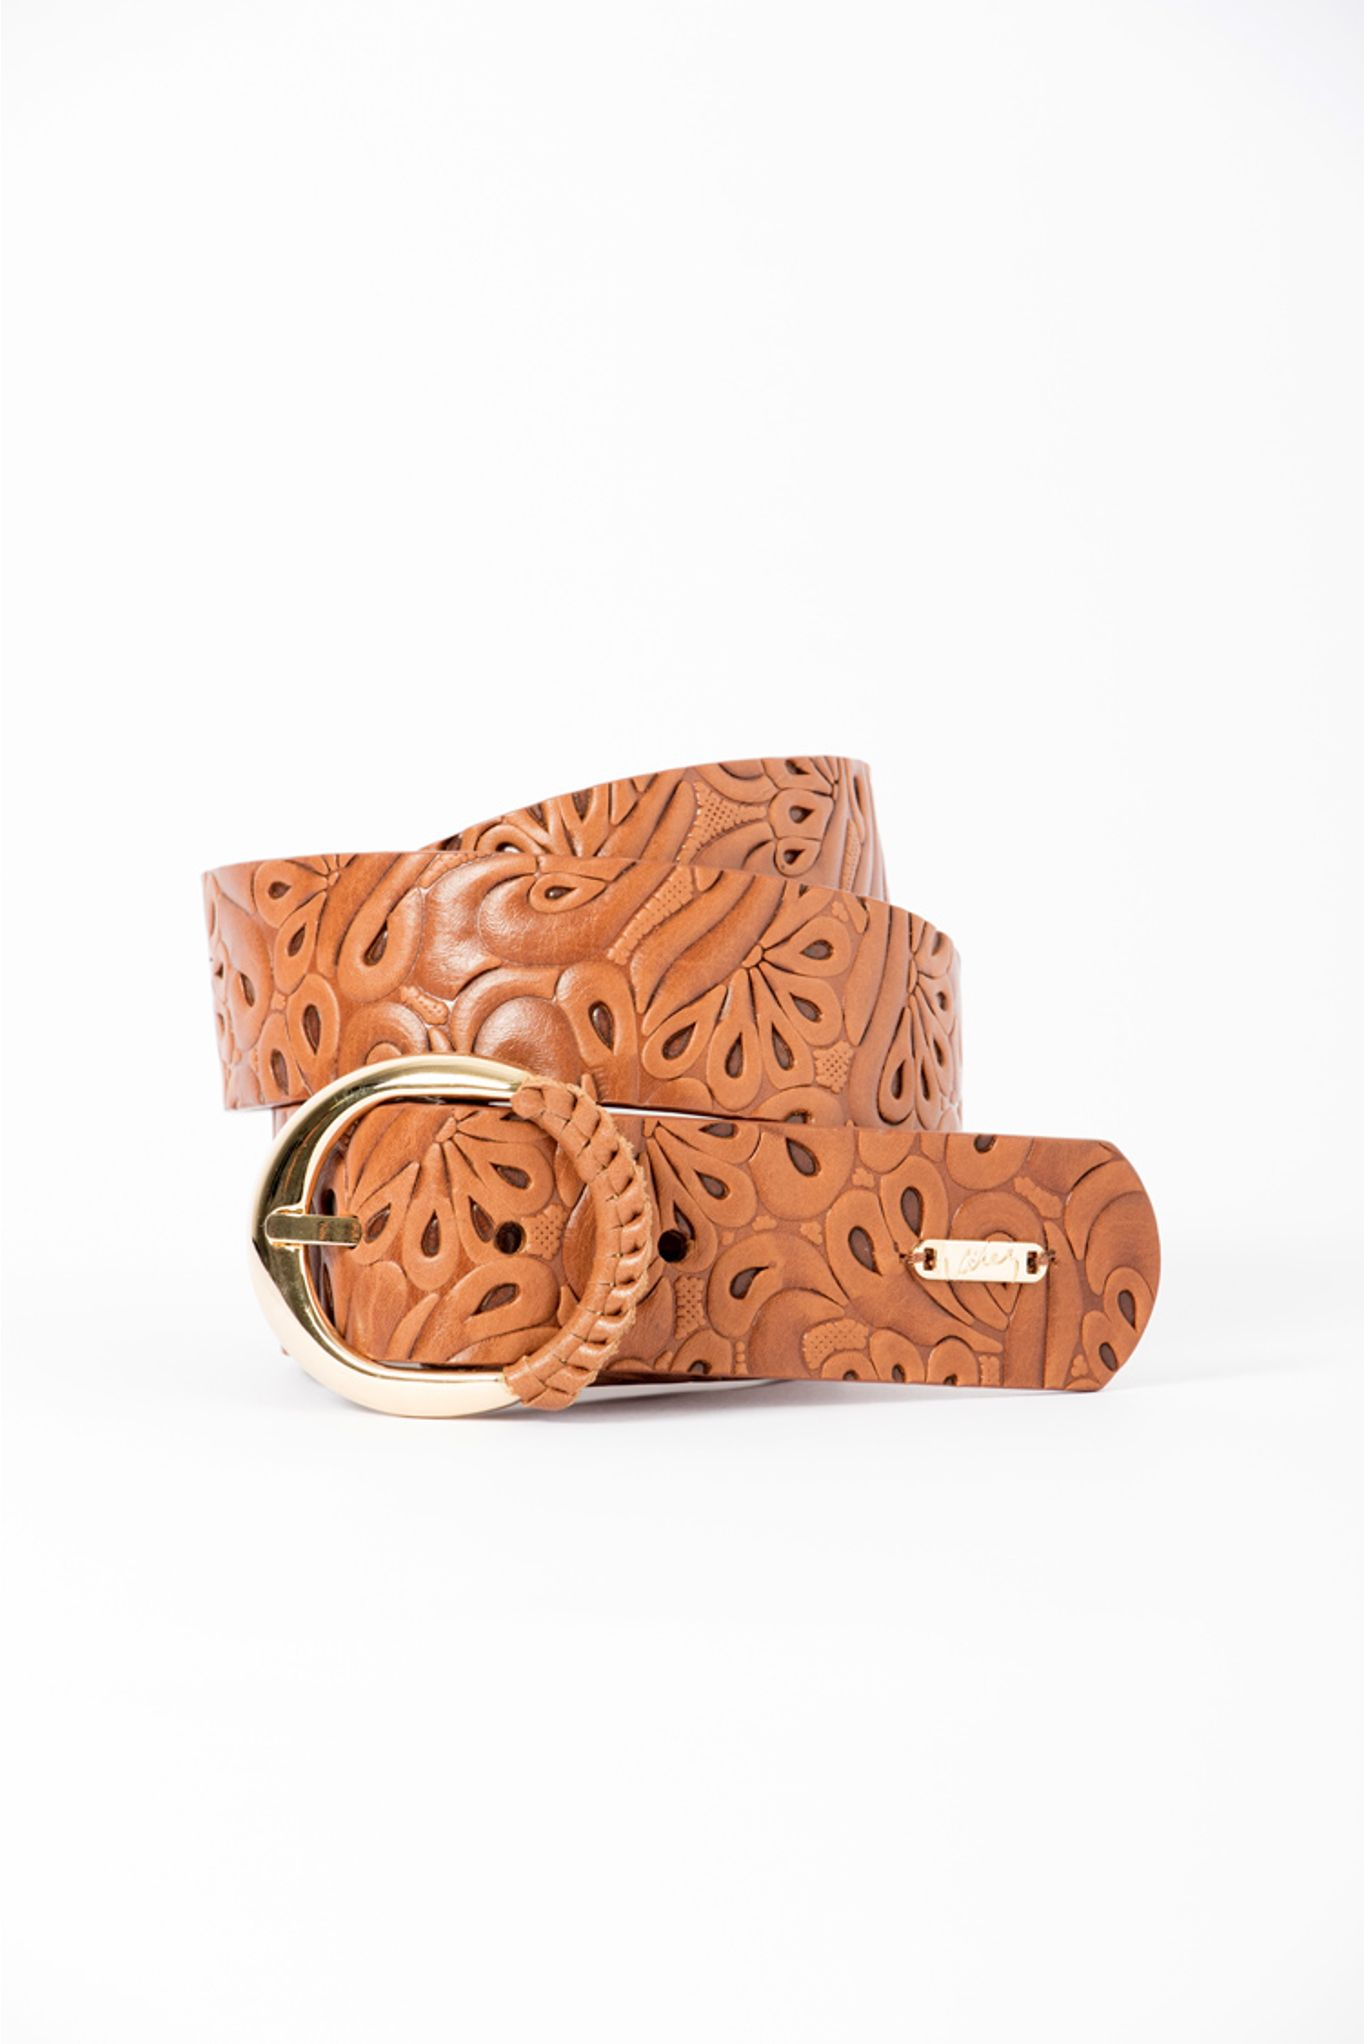 2e7d45997 Cinturón unifaz de cuero para mujer 3418 | Unifaz | Vélez - Velez-18